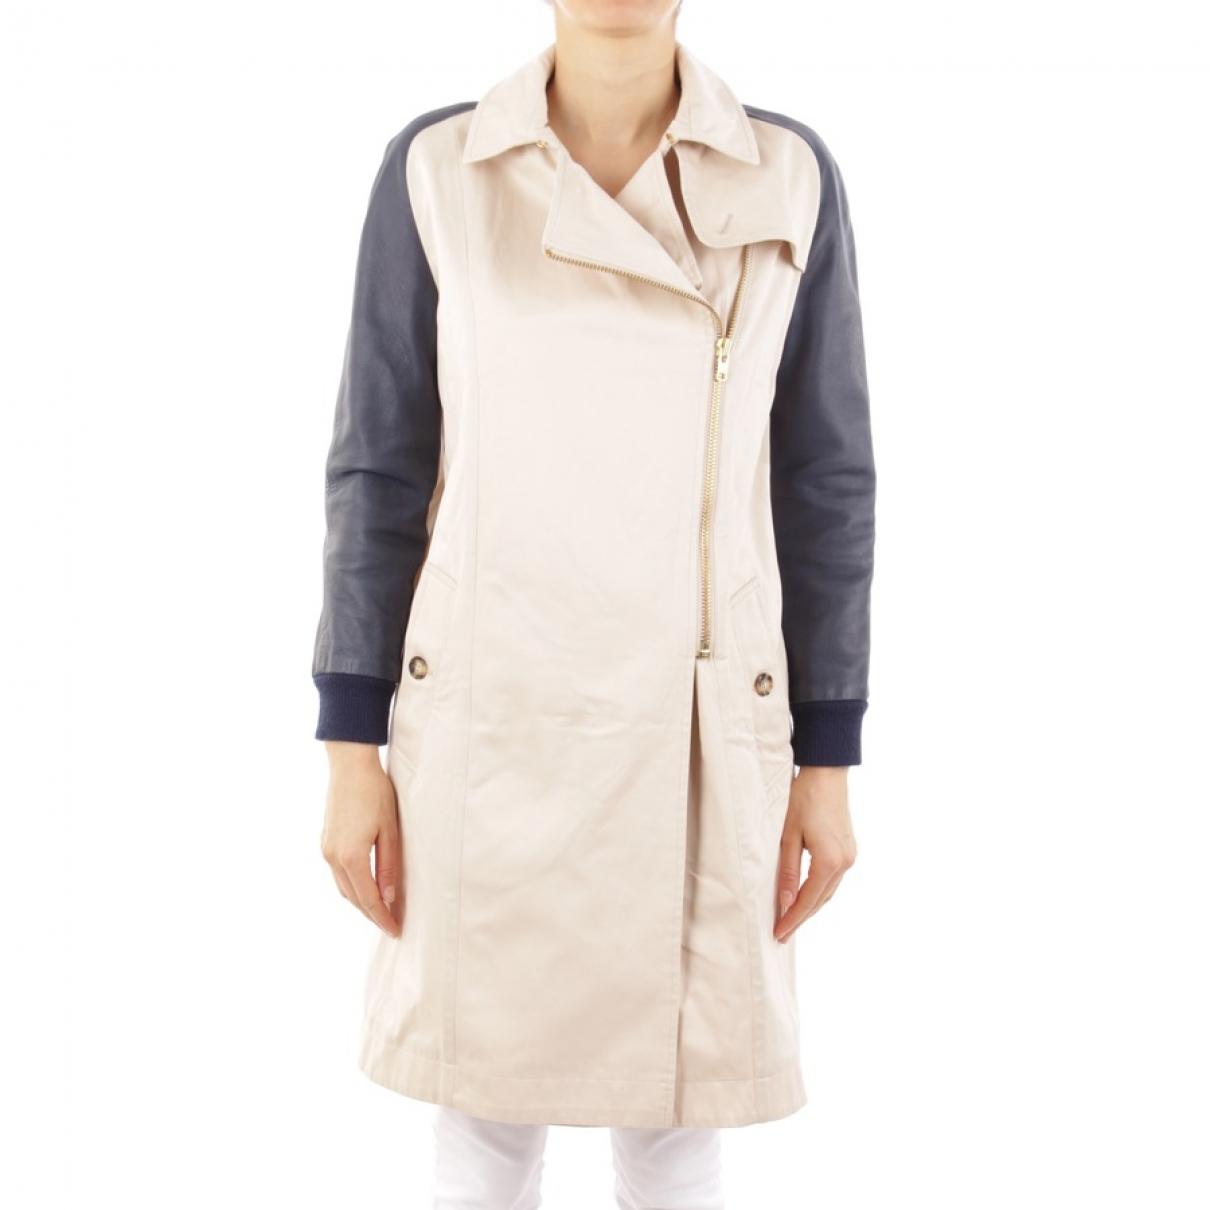 Sophie Hulme \N White Cotton jacket for Women XS International